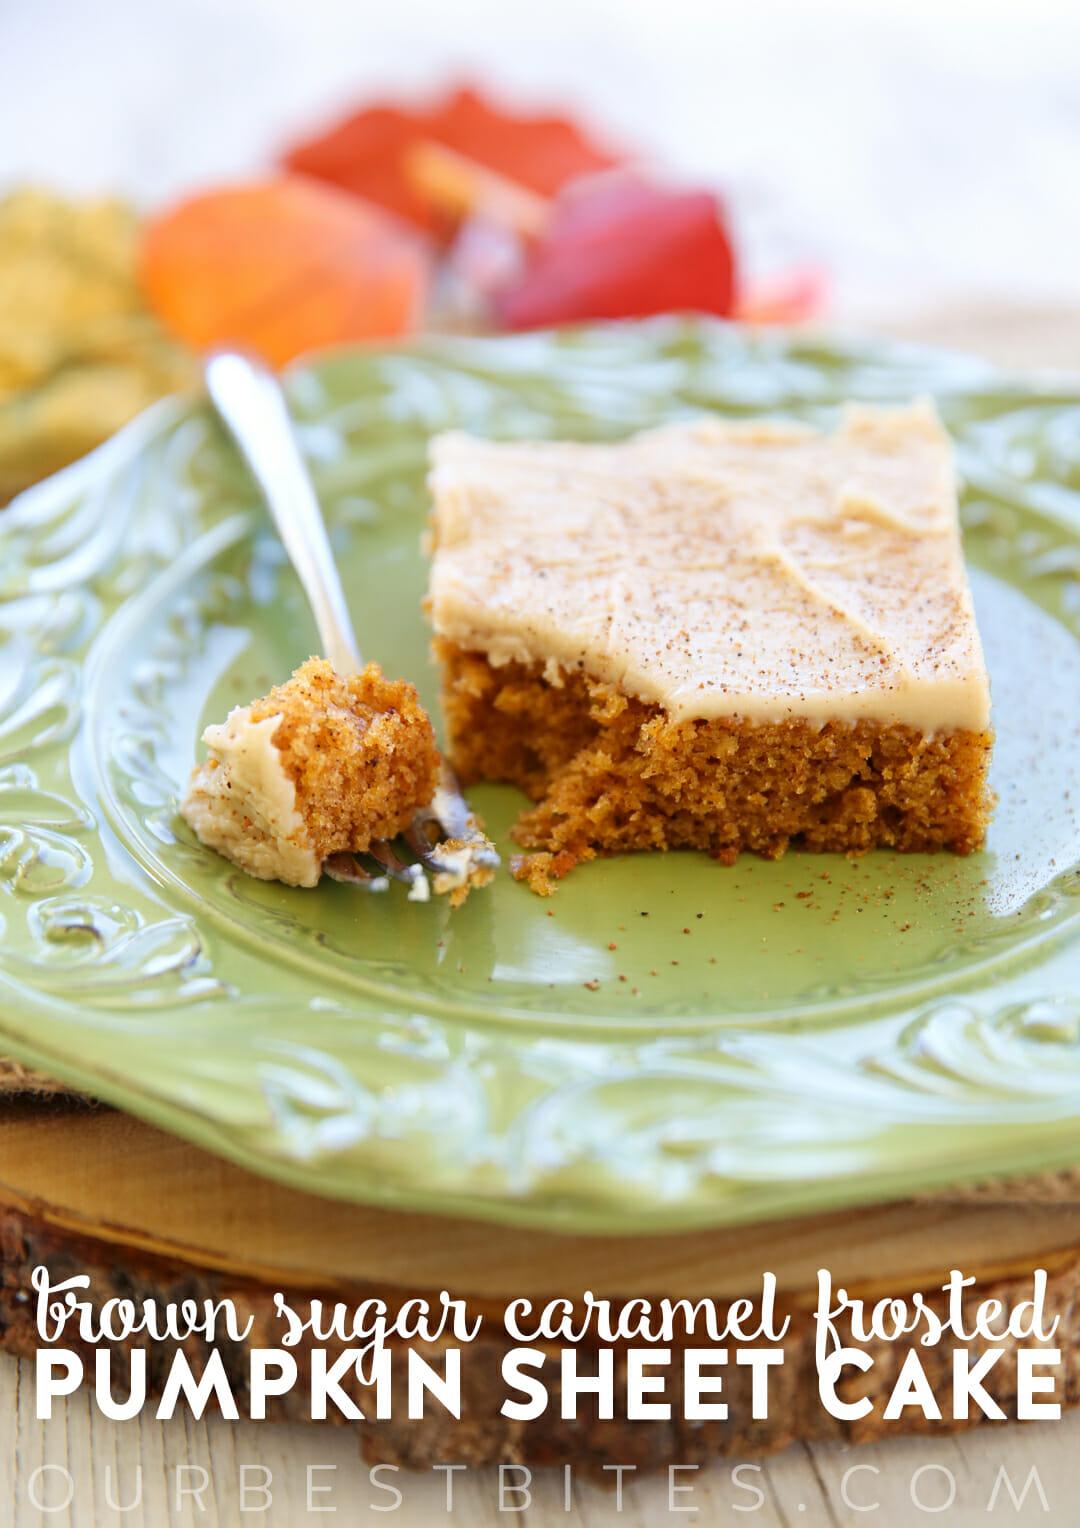 Pumpkin Sheet Cake from Our Best Bites